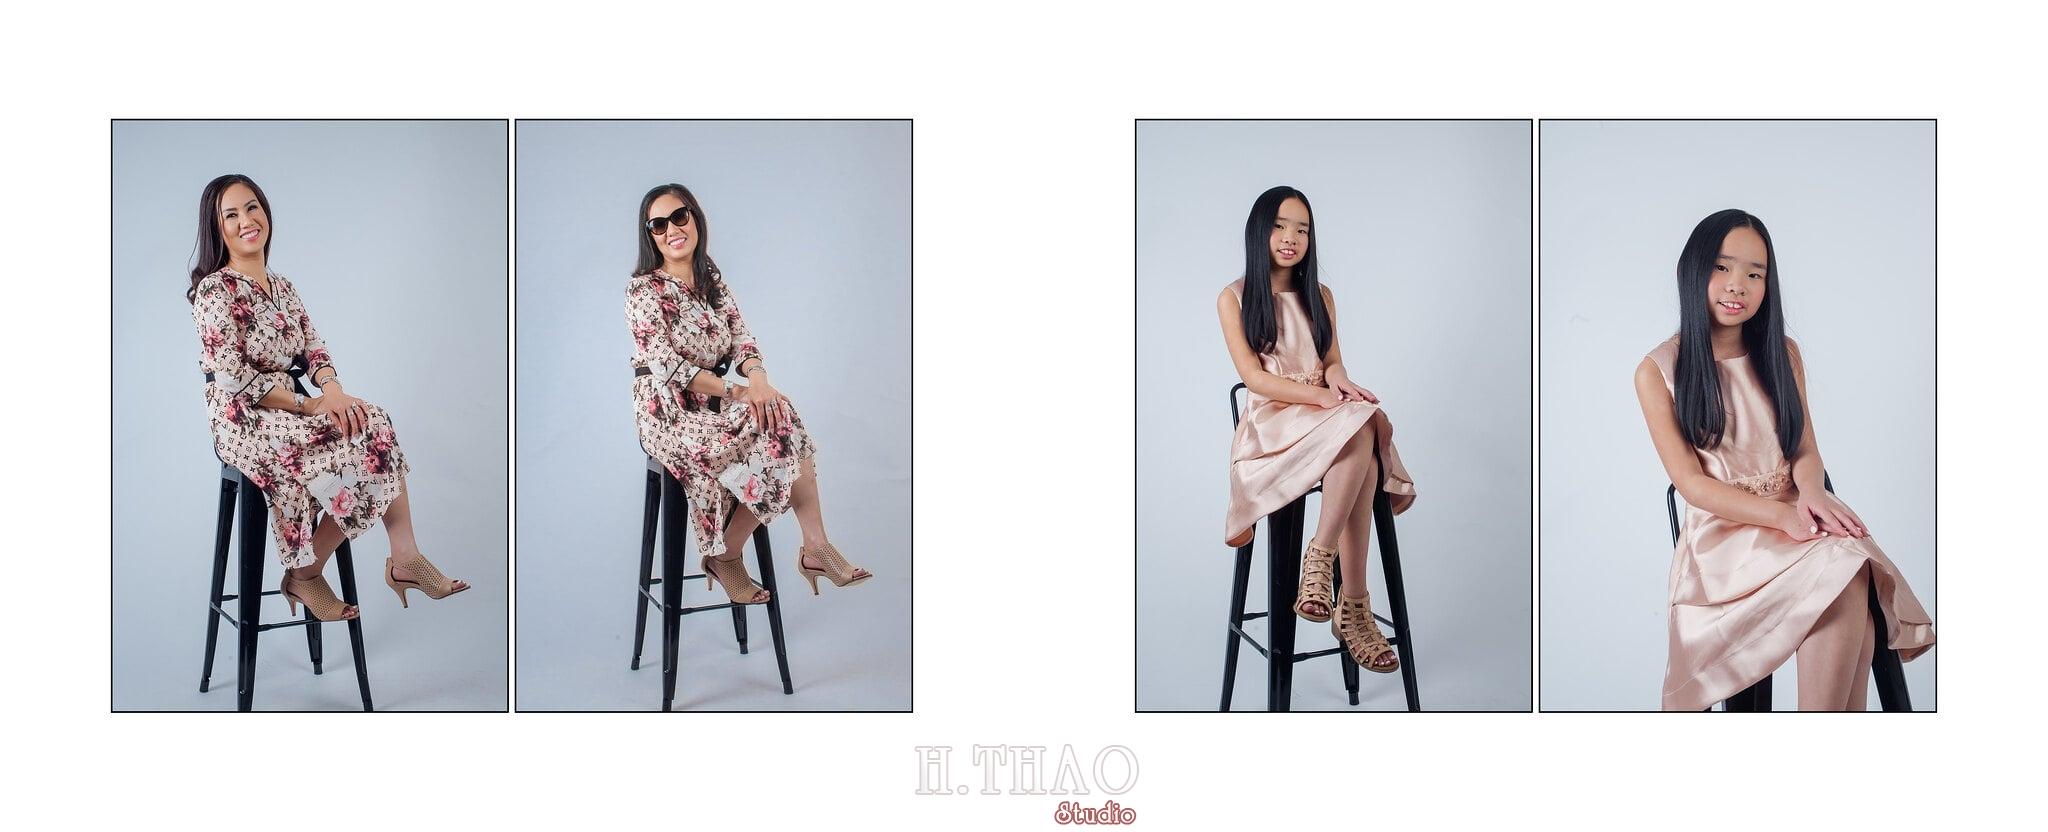 Anh gia dinh Jenny Nguyen 12 - Album ảnh gia đình chị Jenny Nguyễn - HThao Studio